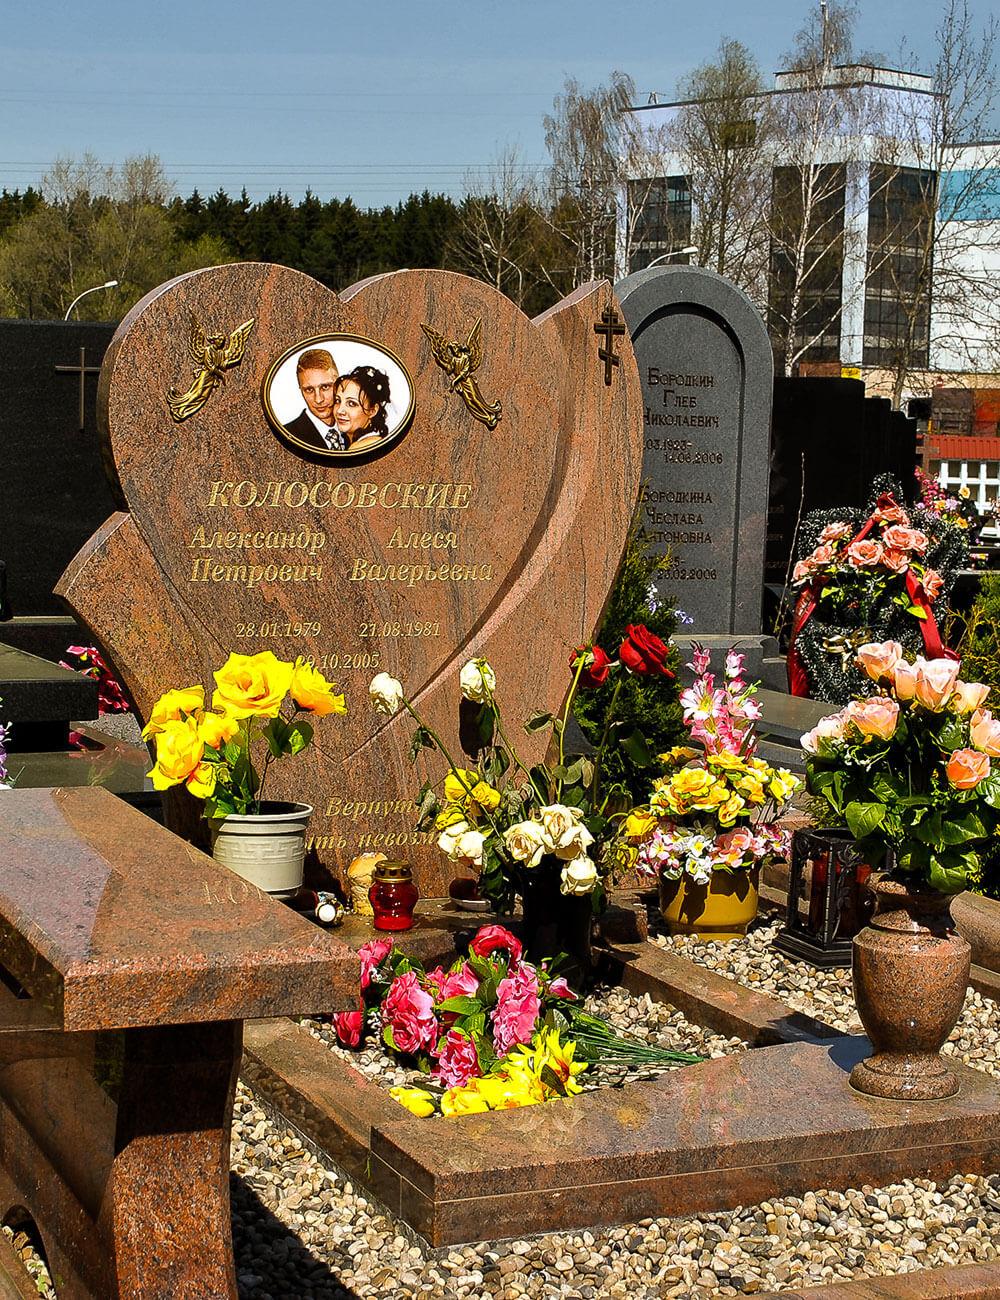 Памятник в виде сердца на могилу